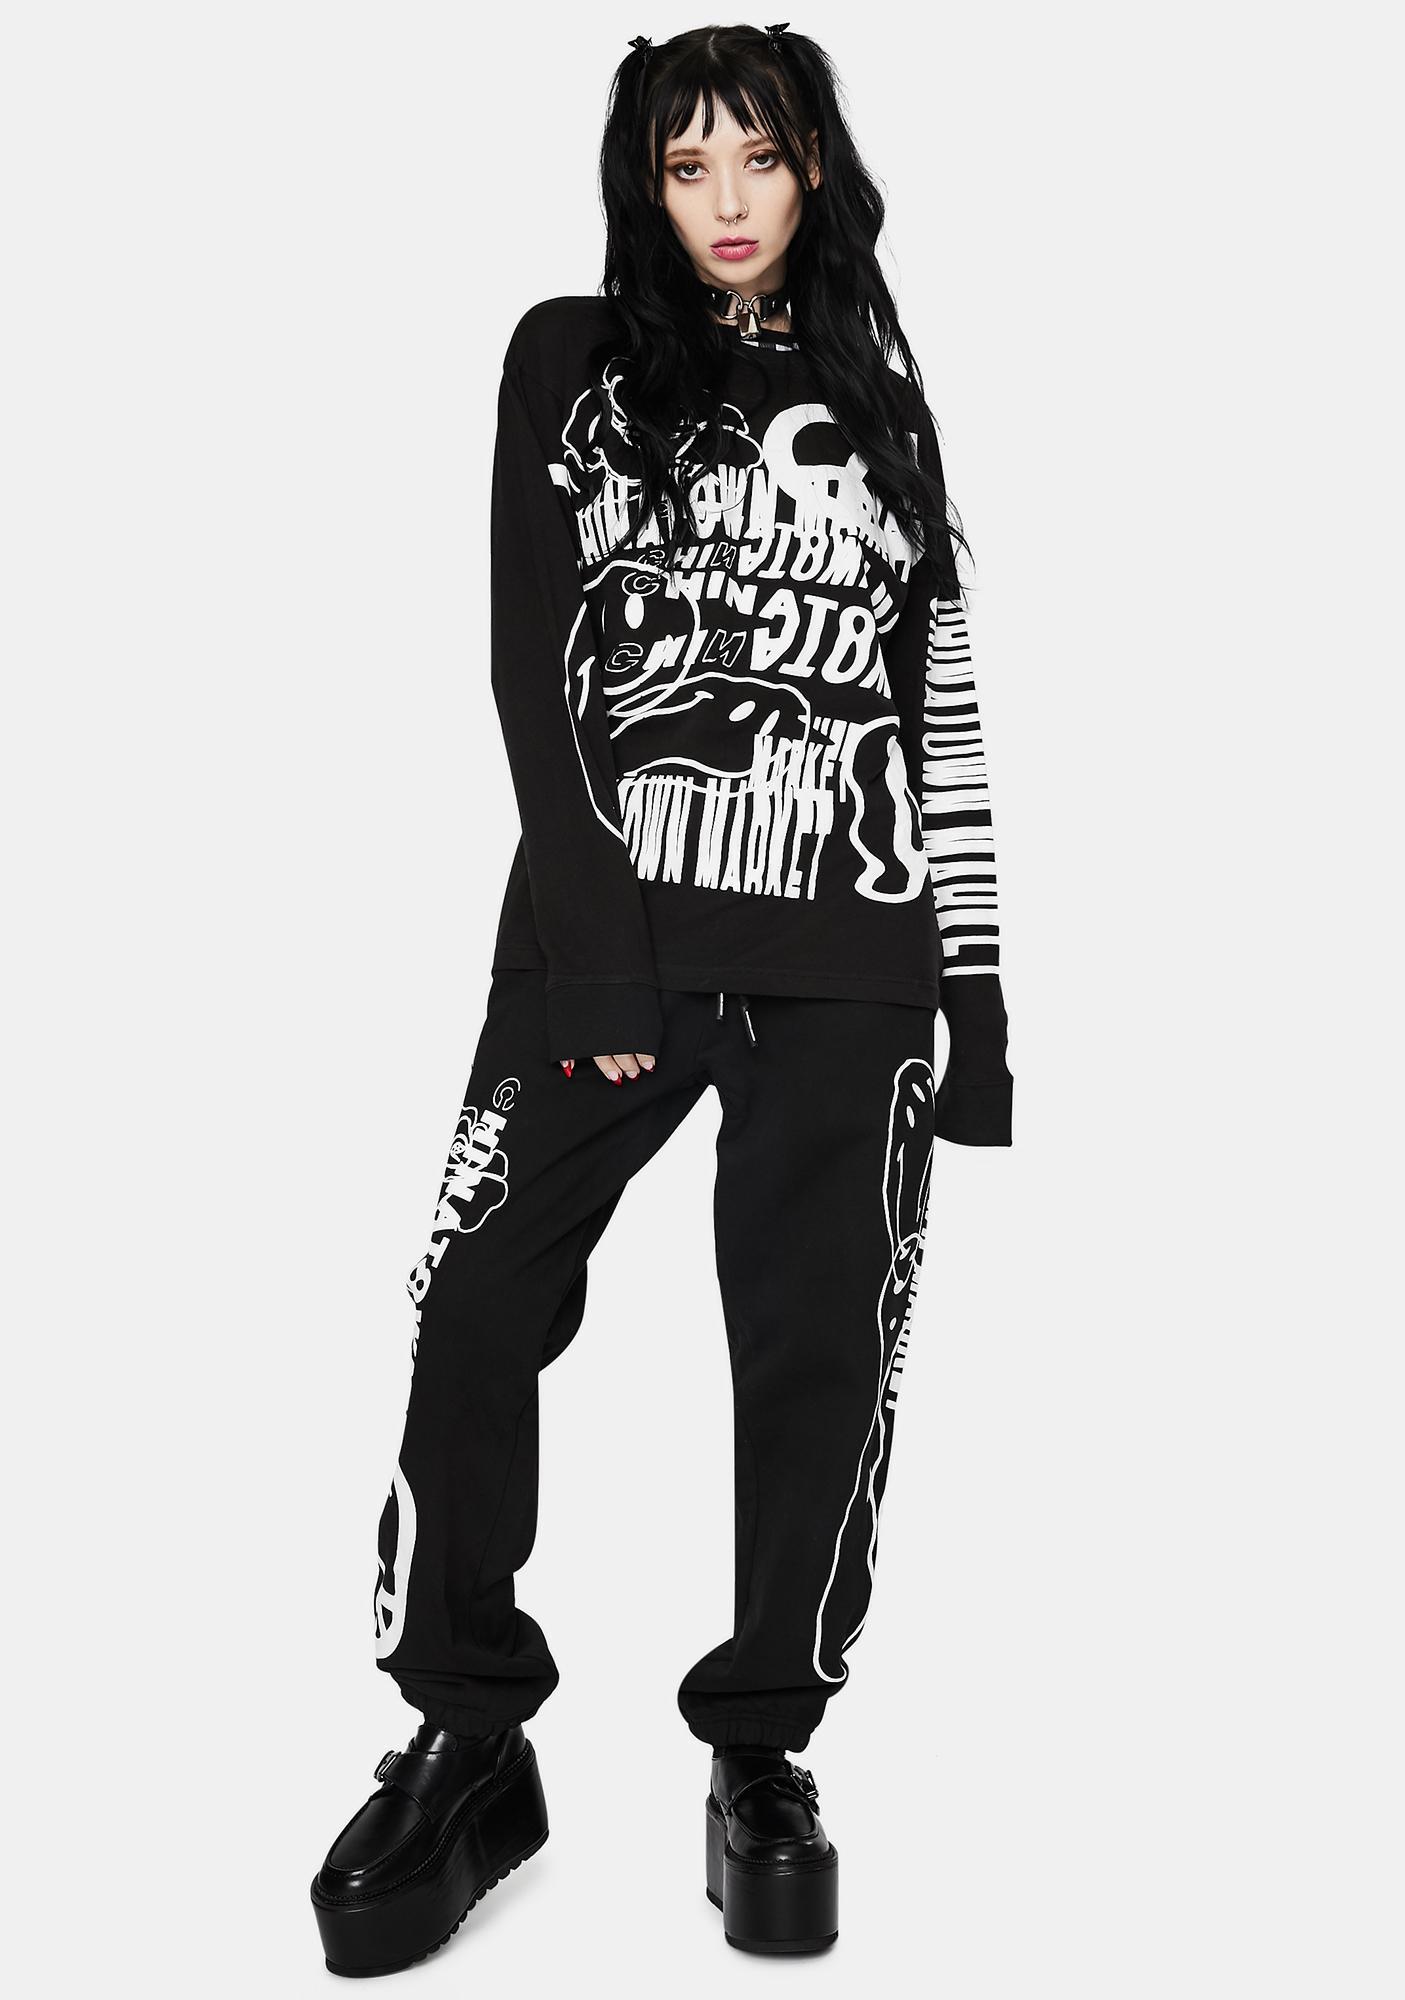 CHINATOWN MARKET Black Warp Graphic Sweatpants